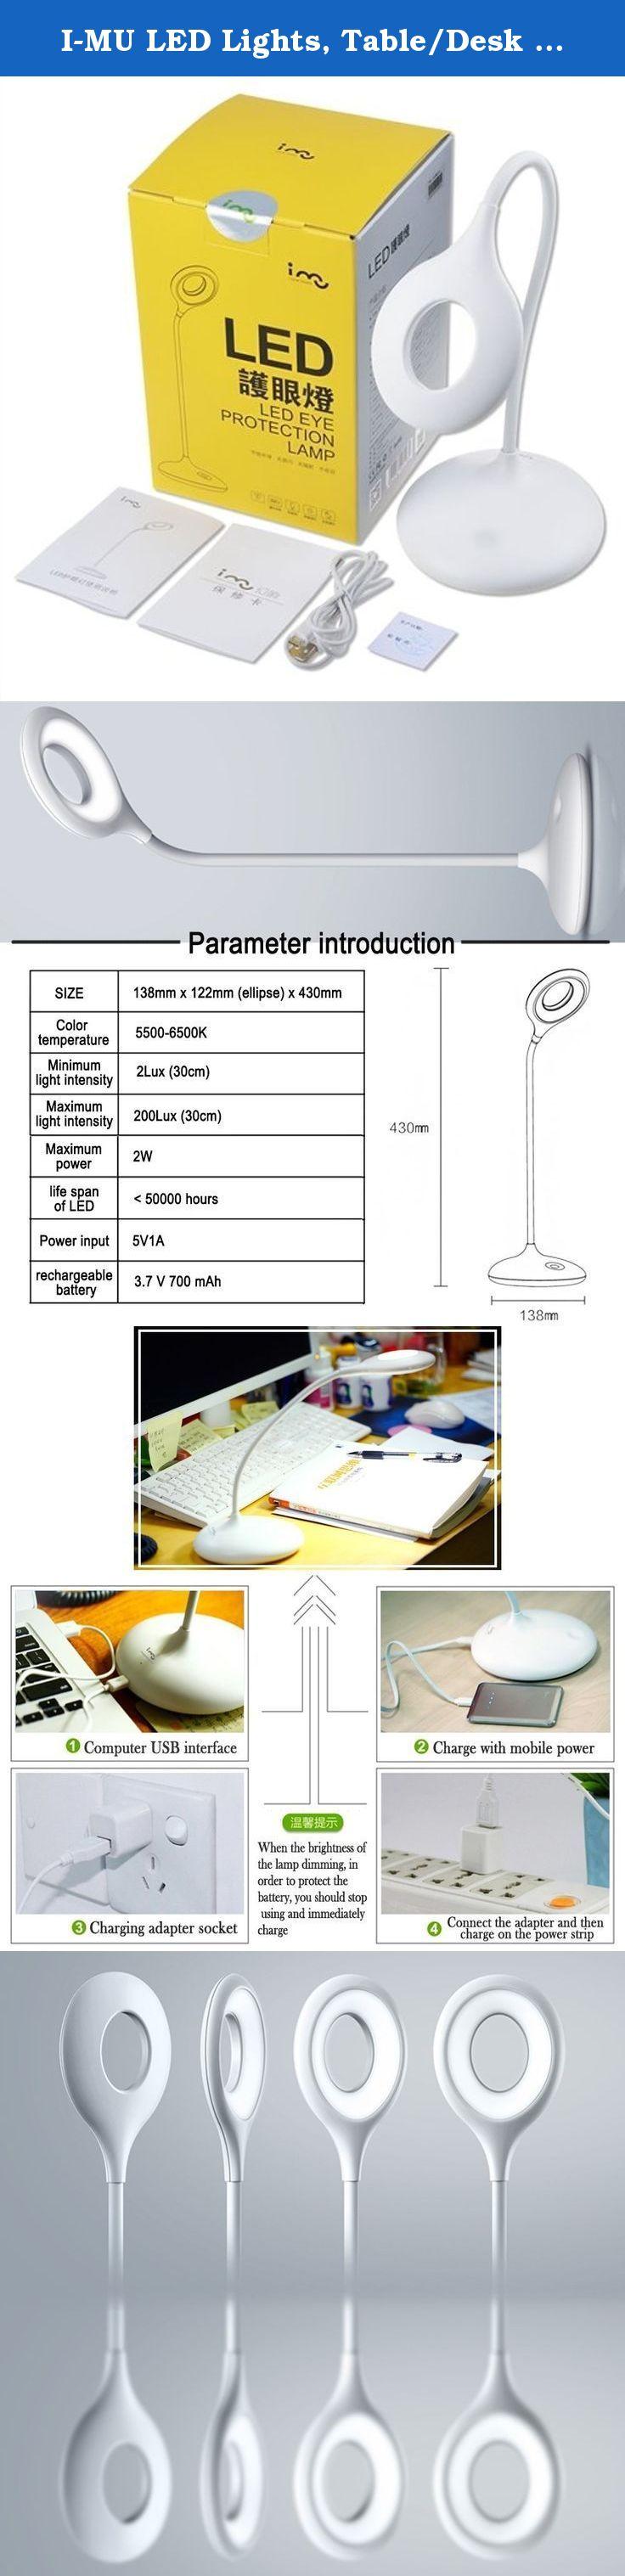 I Mu Led Lights Table Desk Lamp Adjustable Touch Sensor Eye Protecti Desk Lamps Lamps Shades Lighting Ceiling Fans Tools Home Improvement Kid D